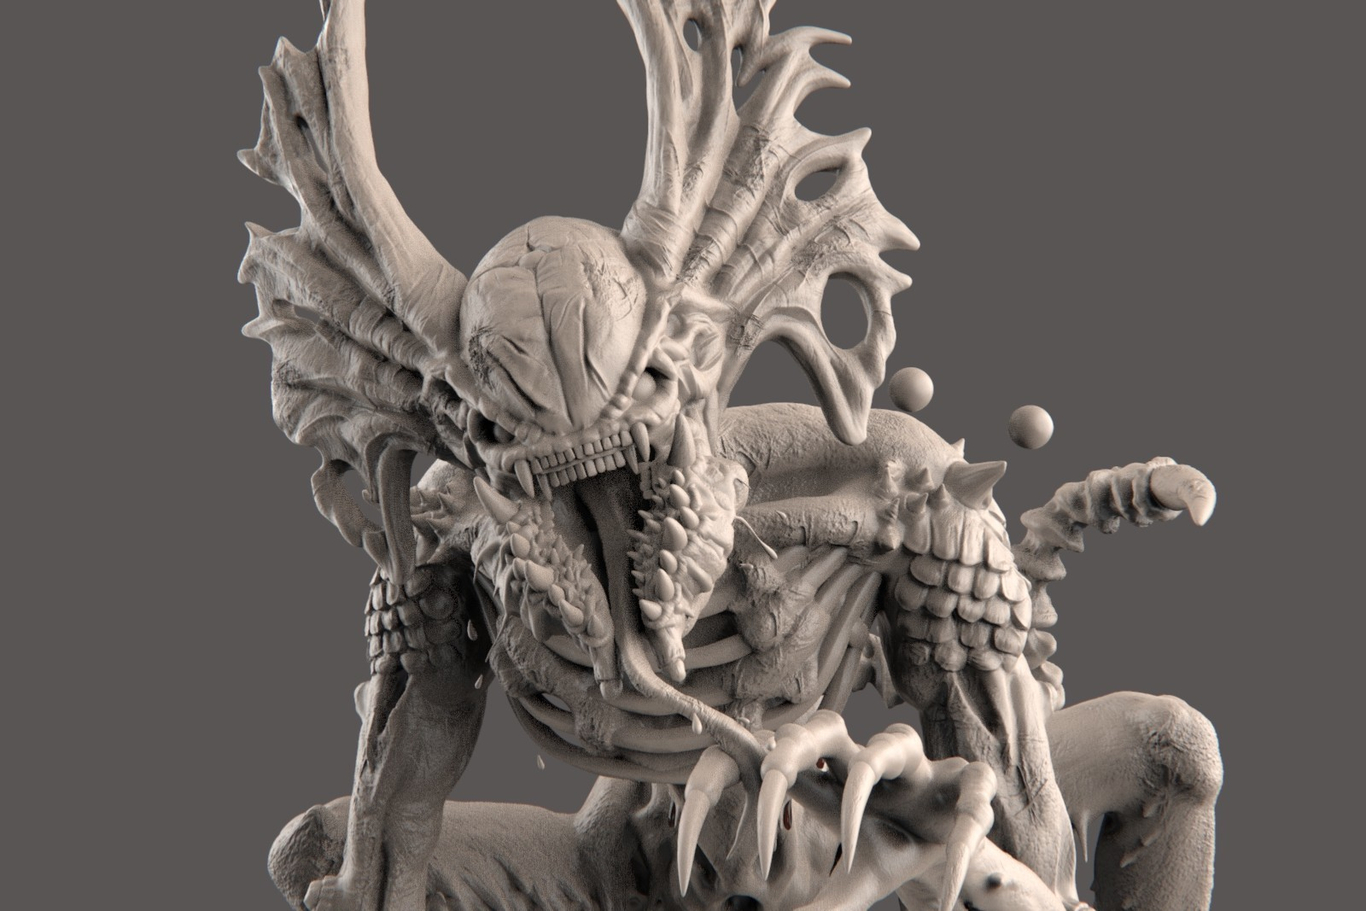 Narendrak creature sculpting 1 ad039381 rhrg